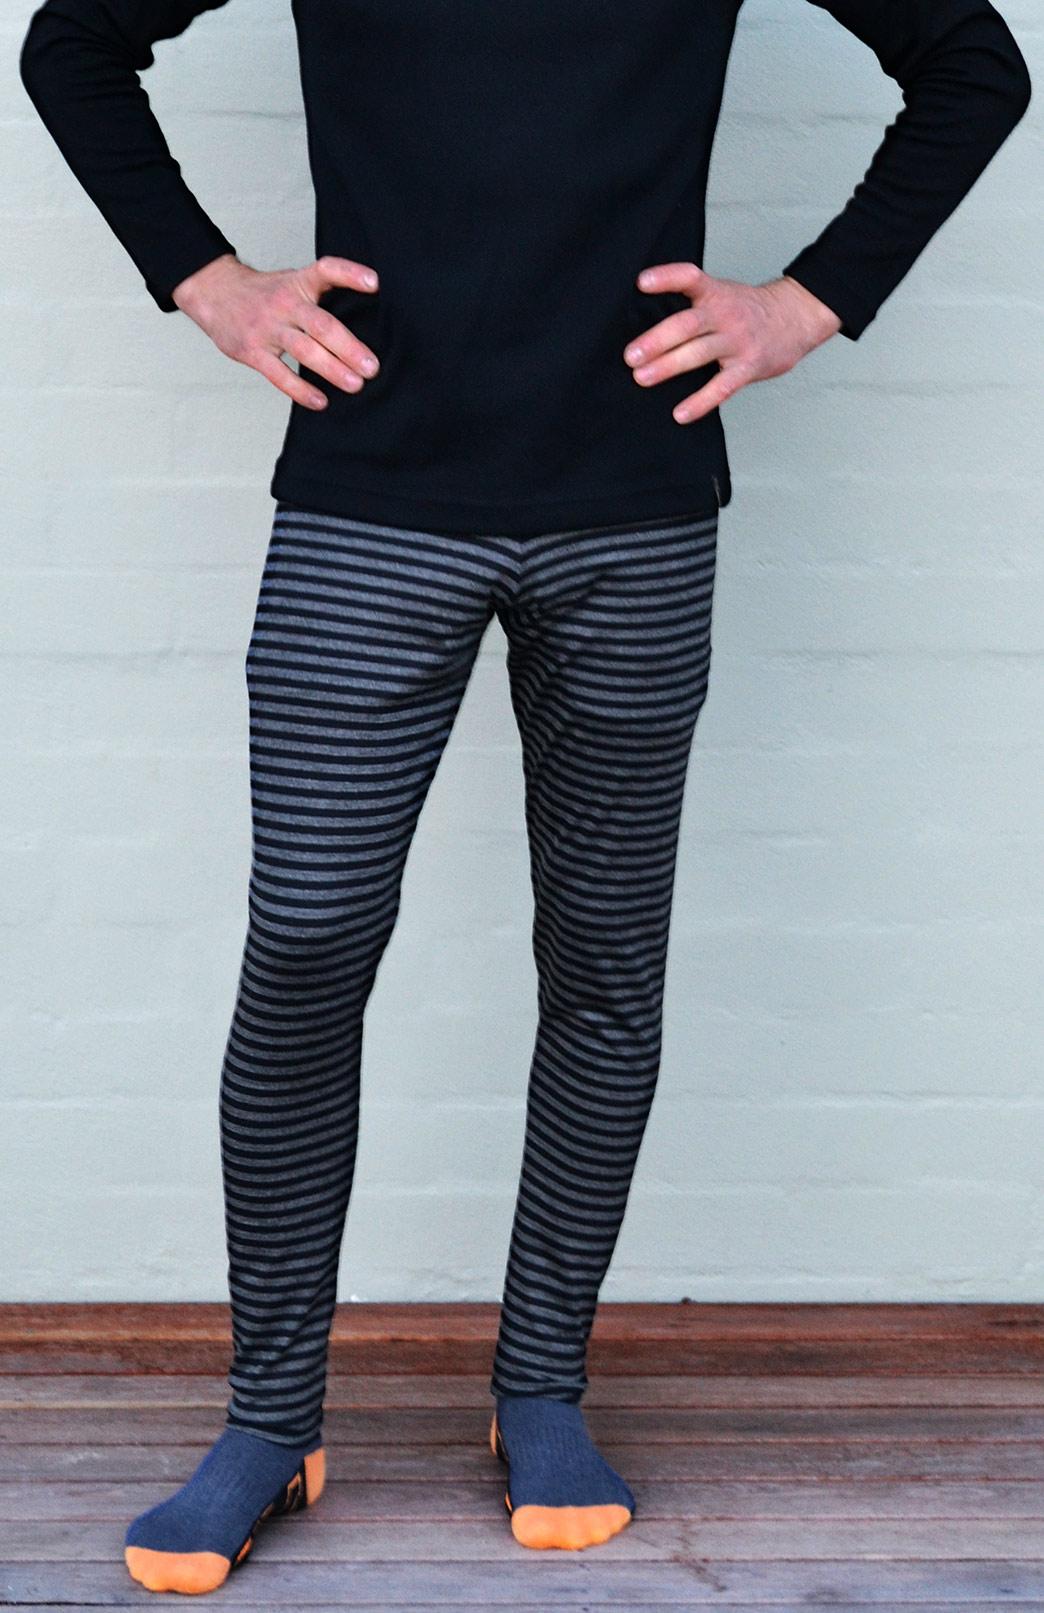 Mens Leggings - 220g - Men's Active and Outdoor Sportswear Thermal Baselayer Leggings - Smitten Merino Tasmania Australia